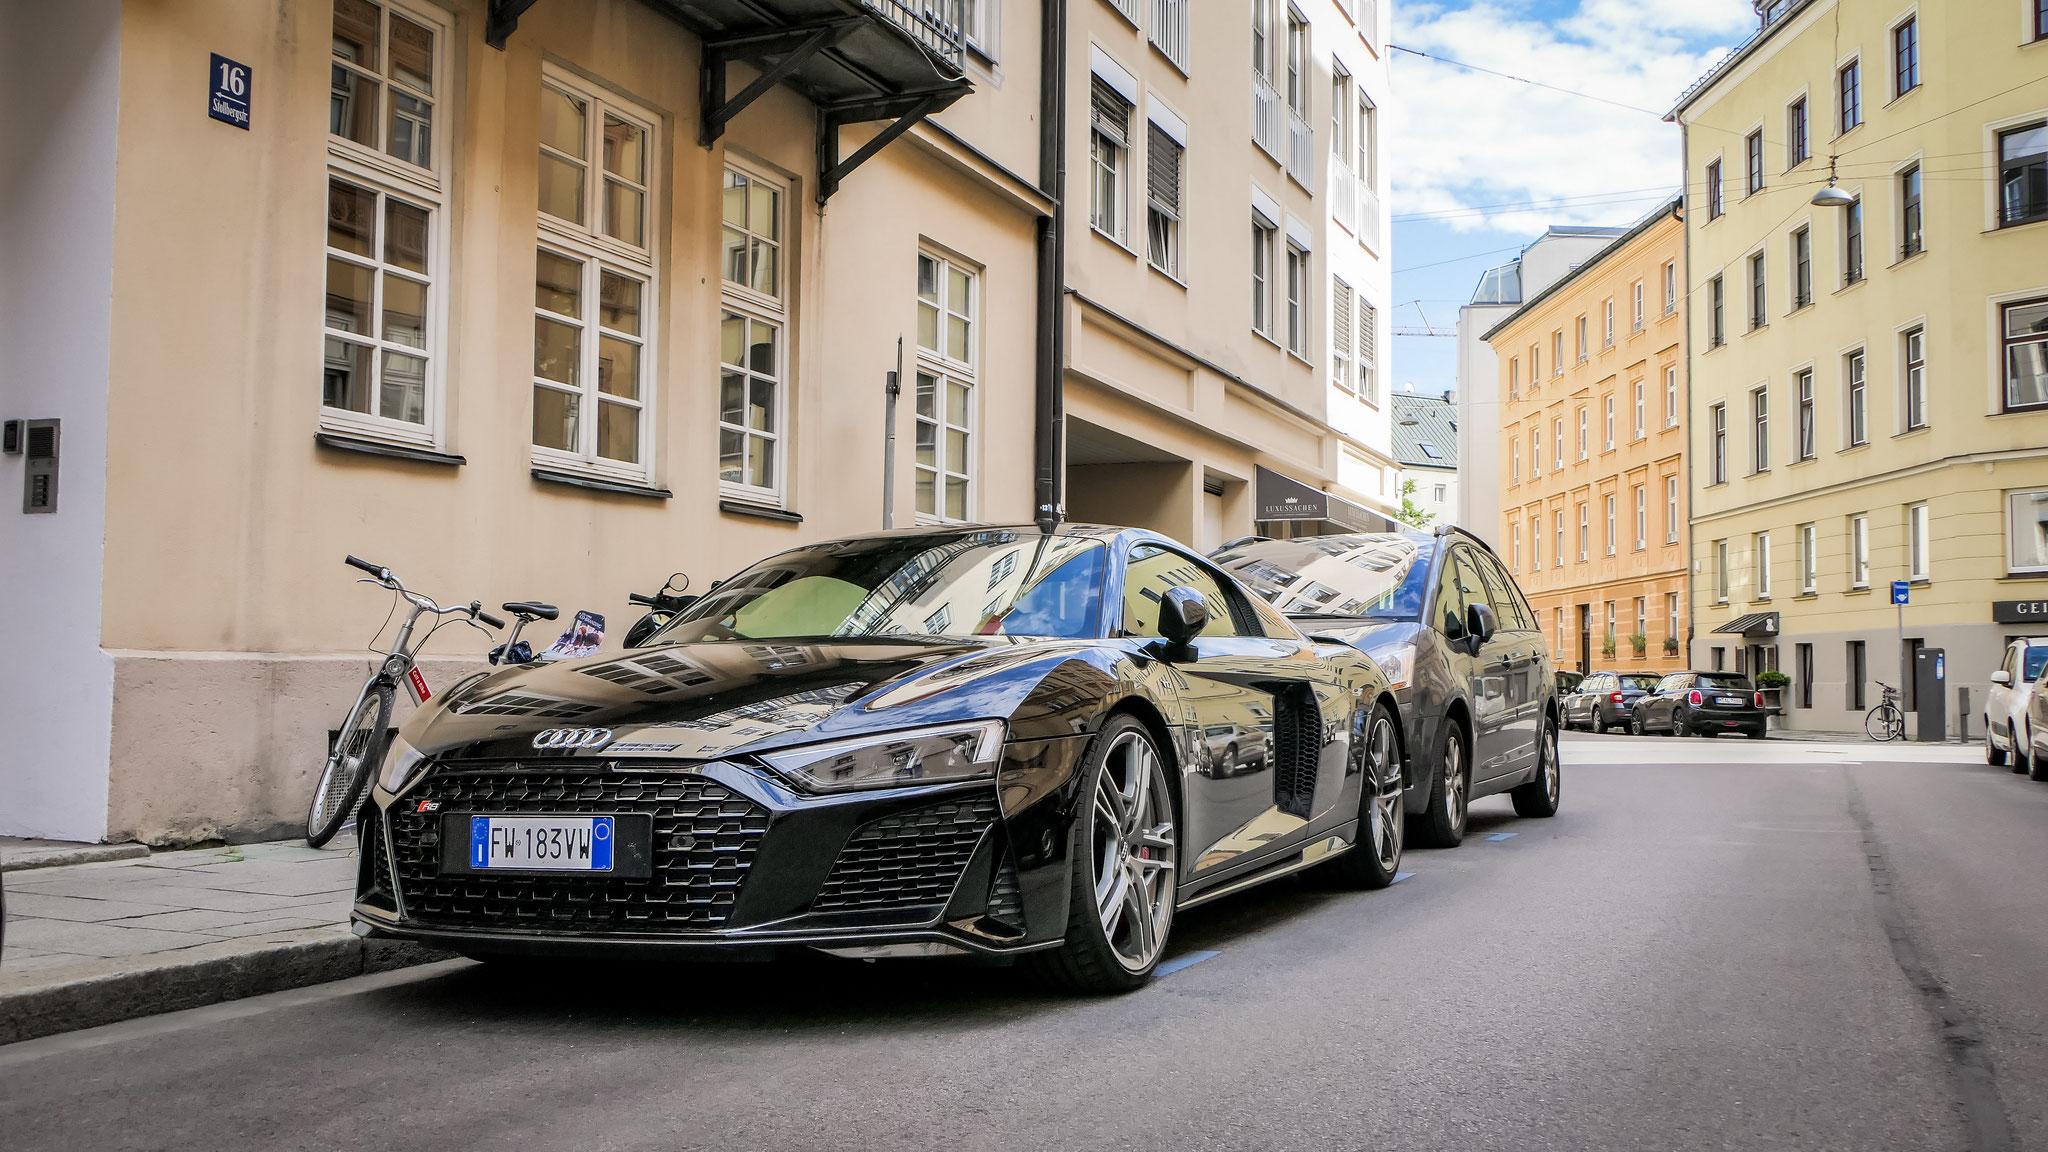 Audi R8 V10 - FW-183-VW (ITA)